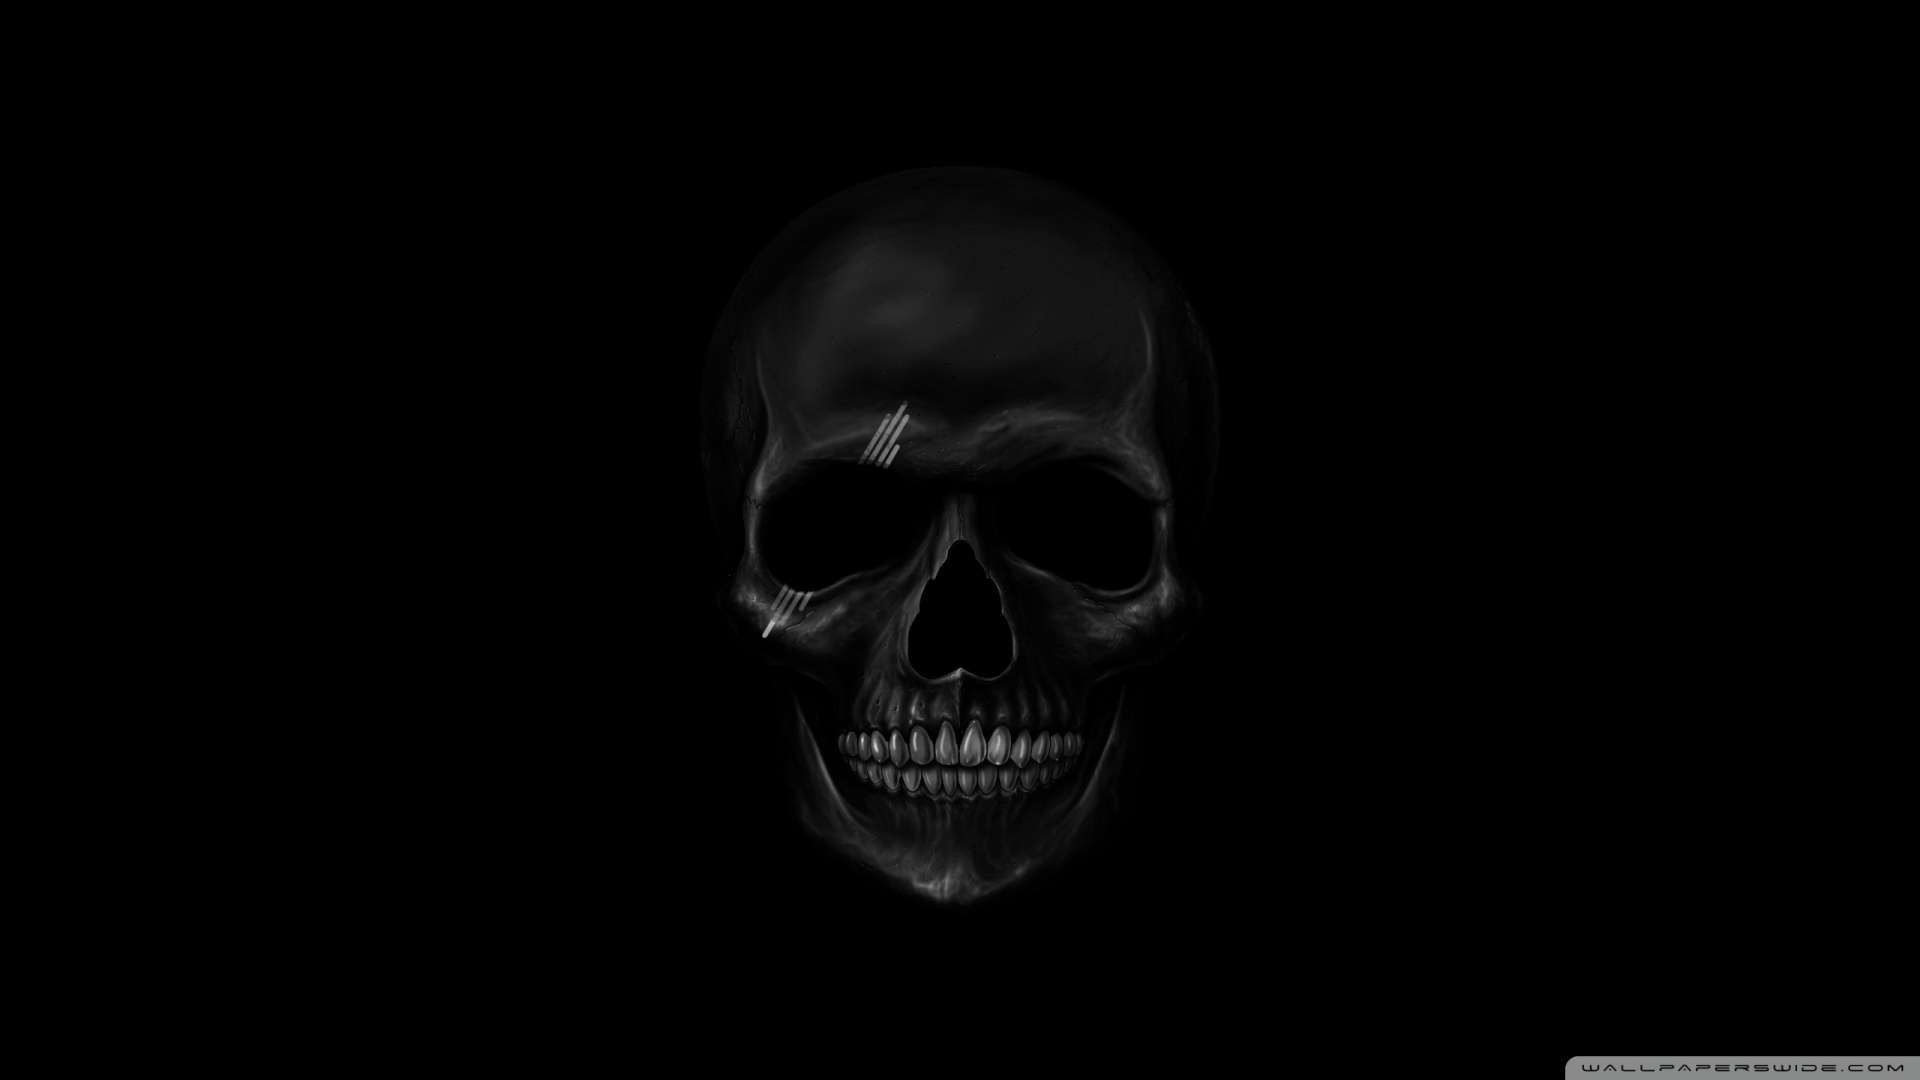 Download 600+ Wallpaper Black Hd Photo HD